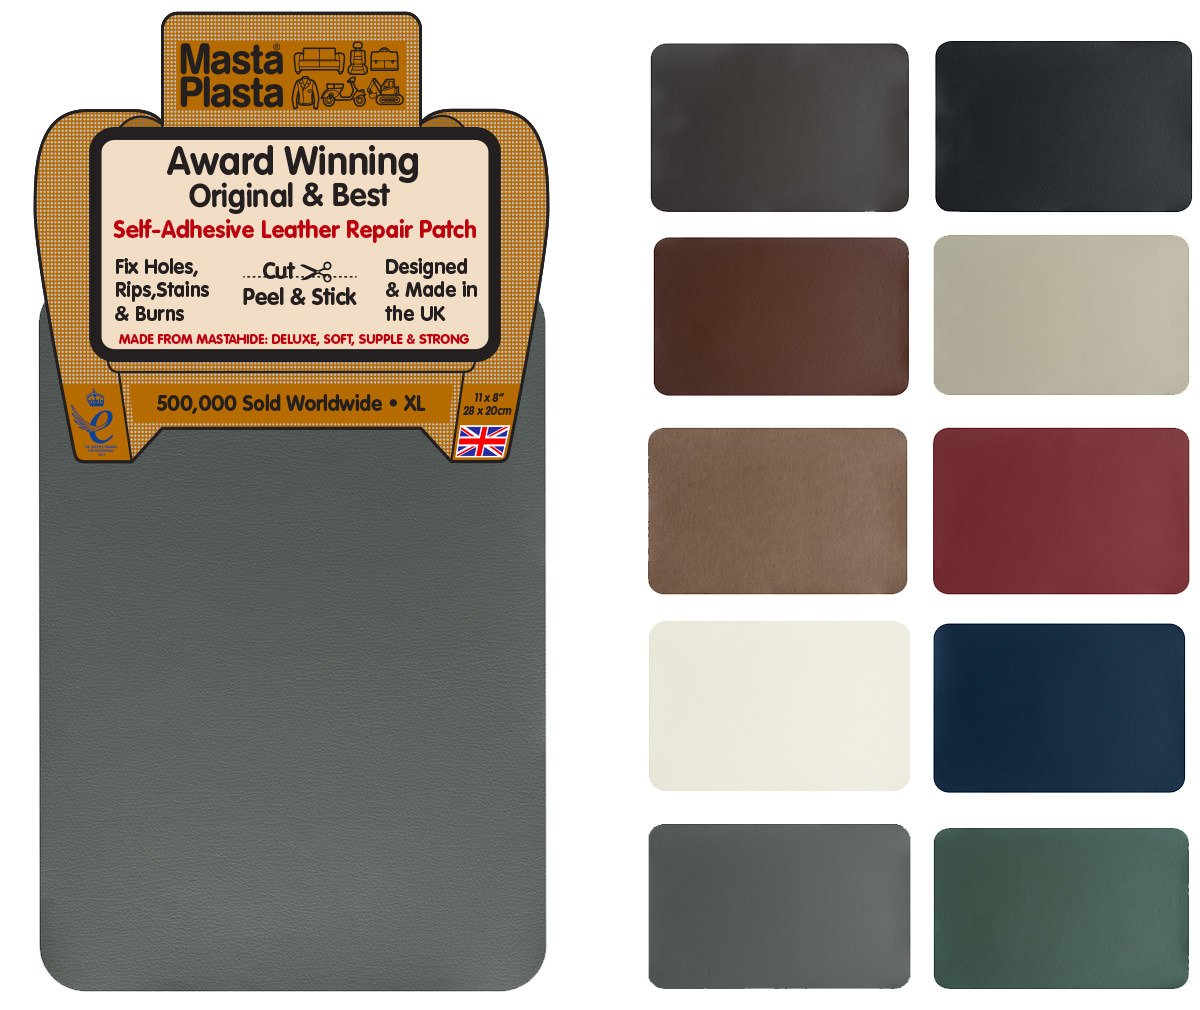 MastaPlasta Self-Adhesive Leather Repair Patch. New XL 28cmx20cm. Choose colour. First-aid for sofas, car seats. Fix holes, rips, burns, stains (BEIGE XL, BEIGE) MastaPlasta Ltd